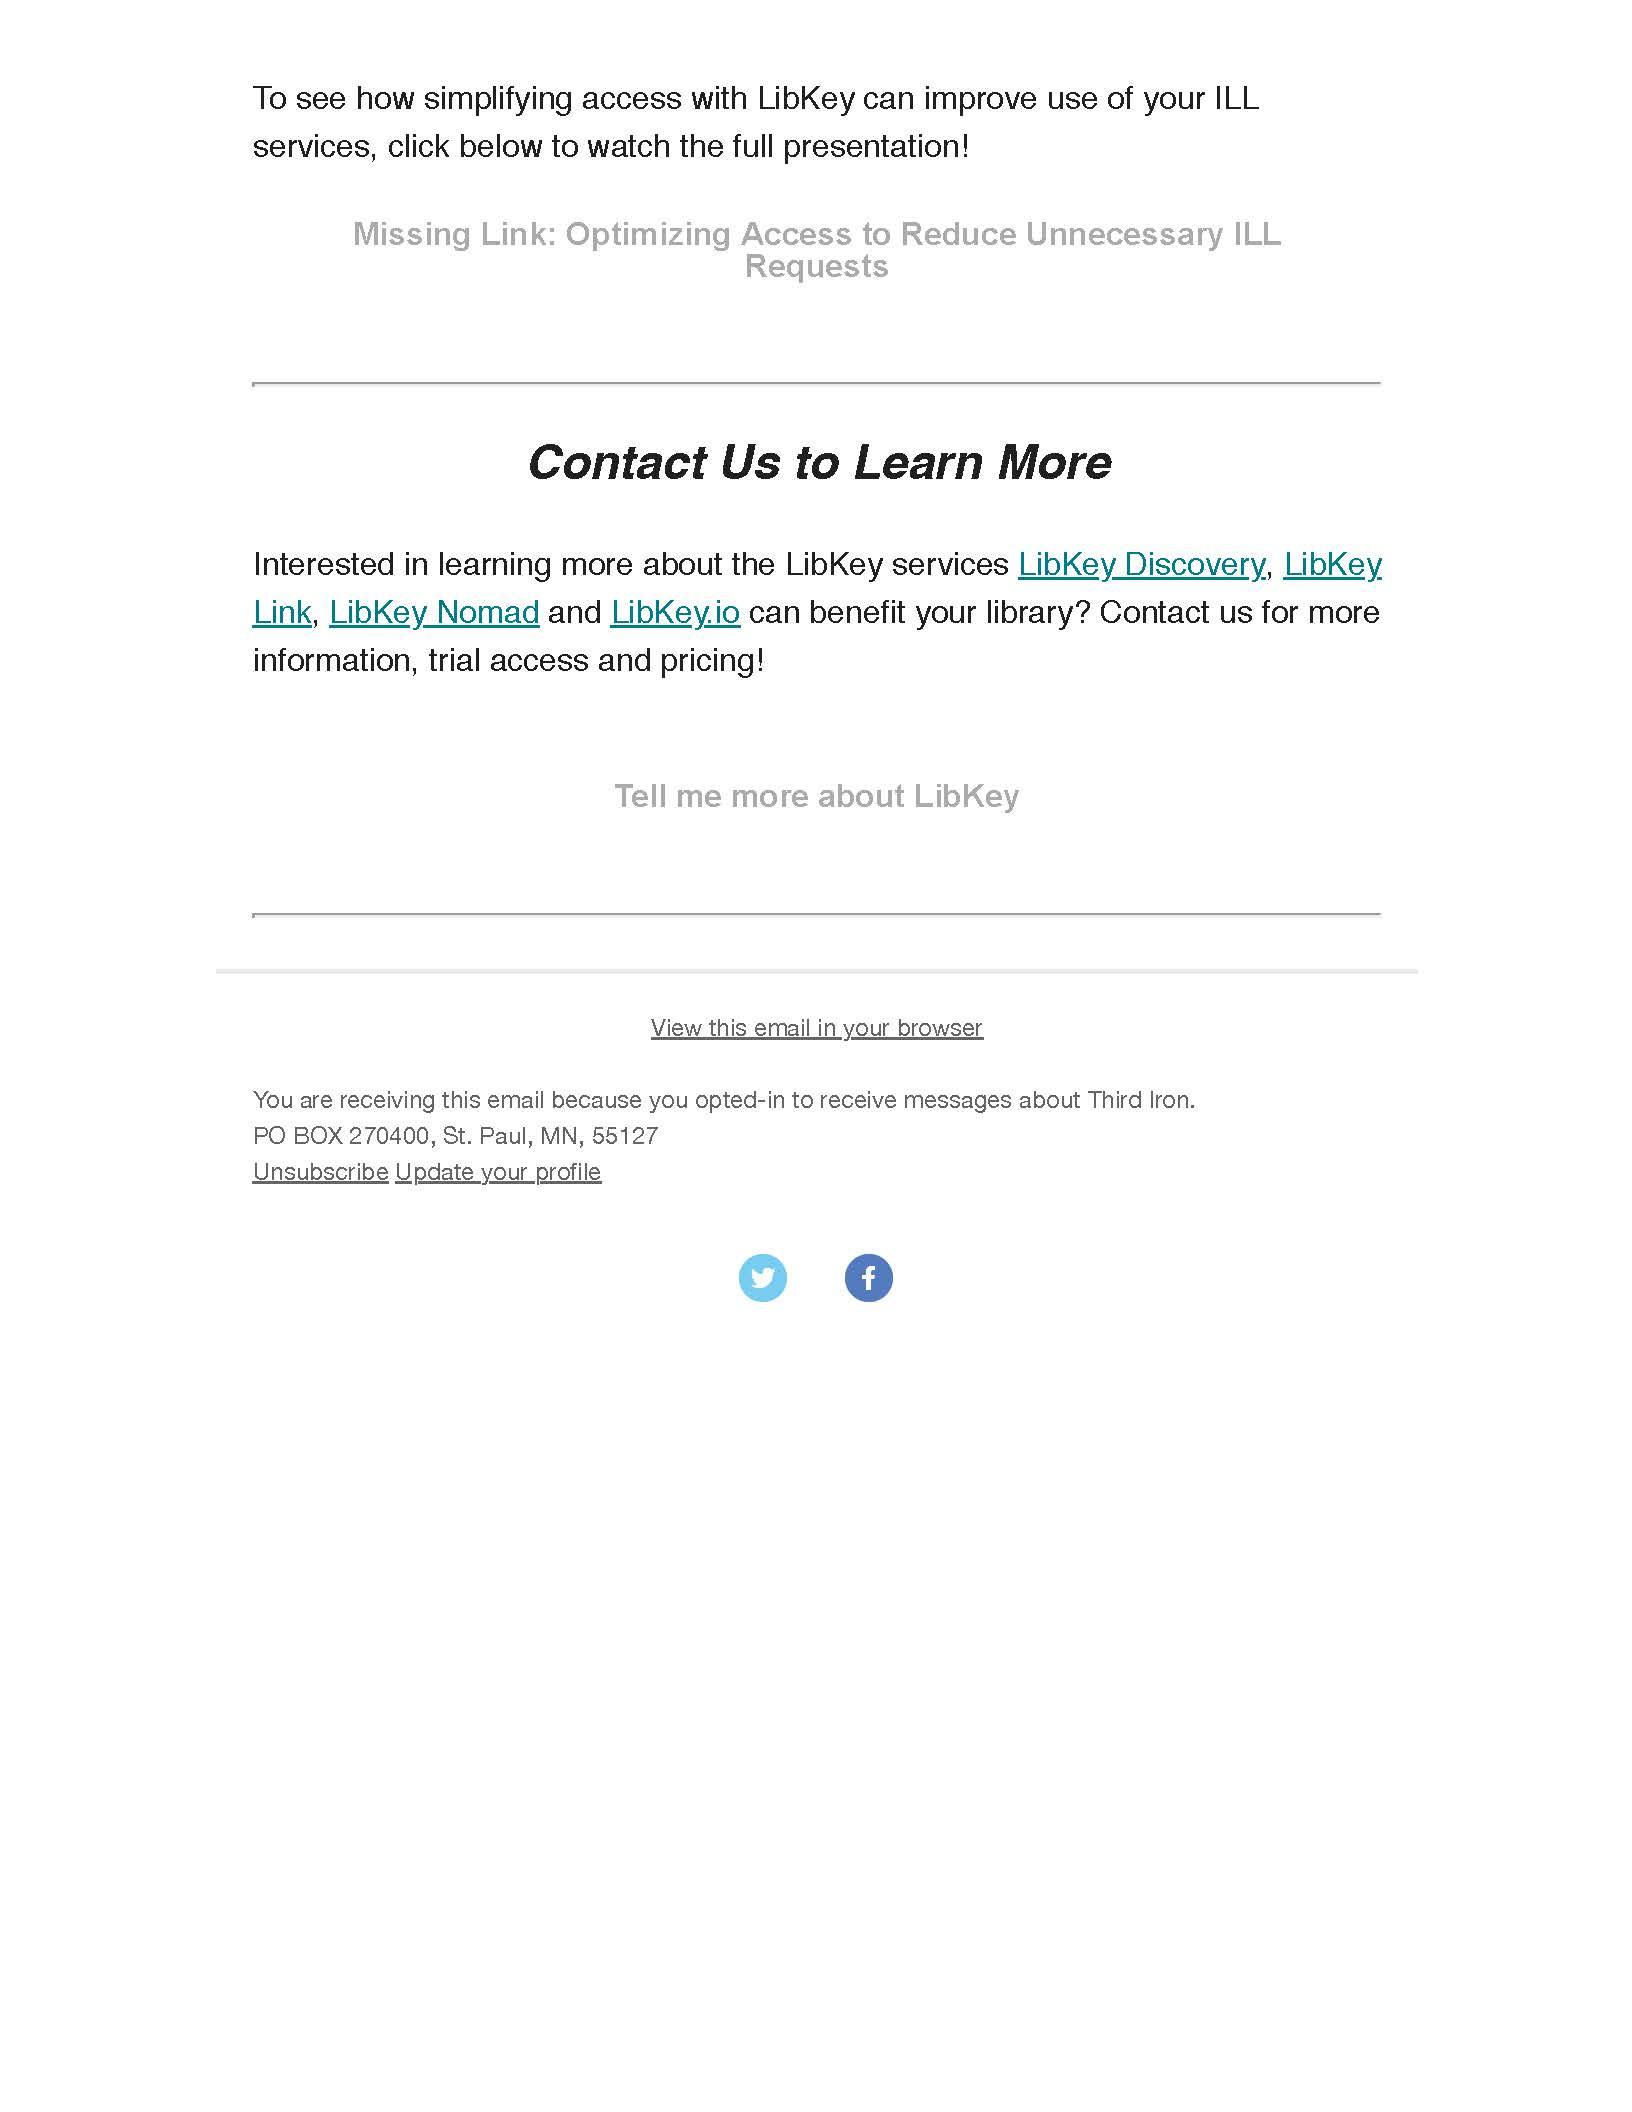 Third Iron Newsletter 10-19-2020_Page_4